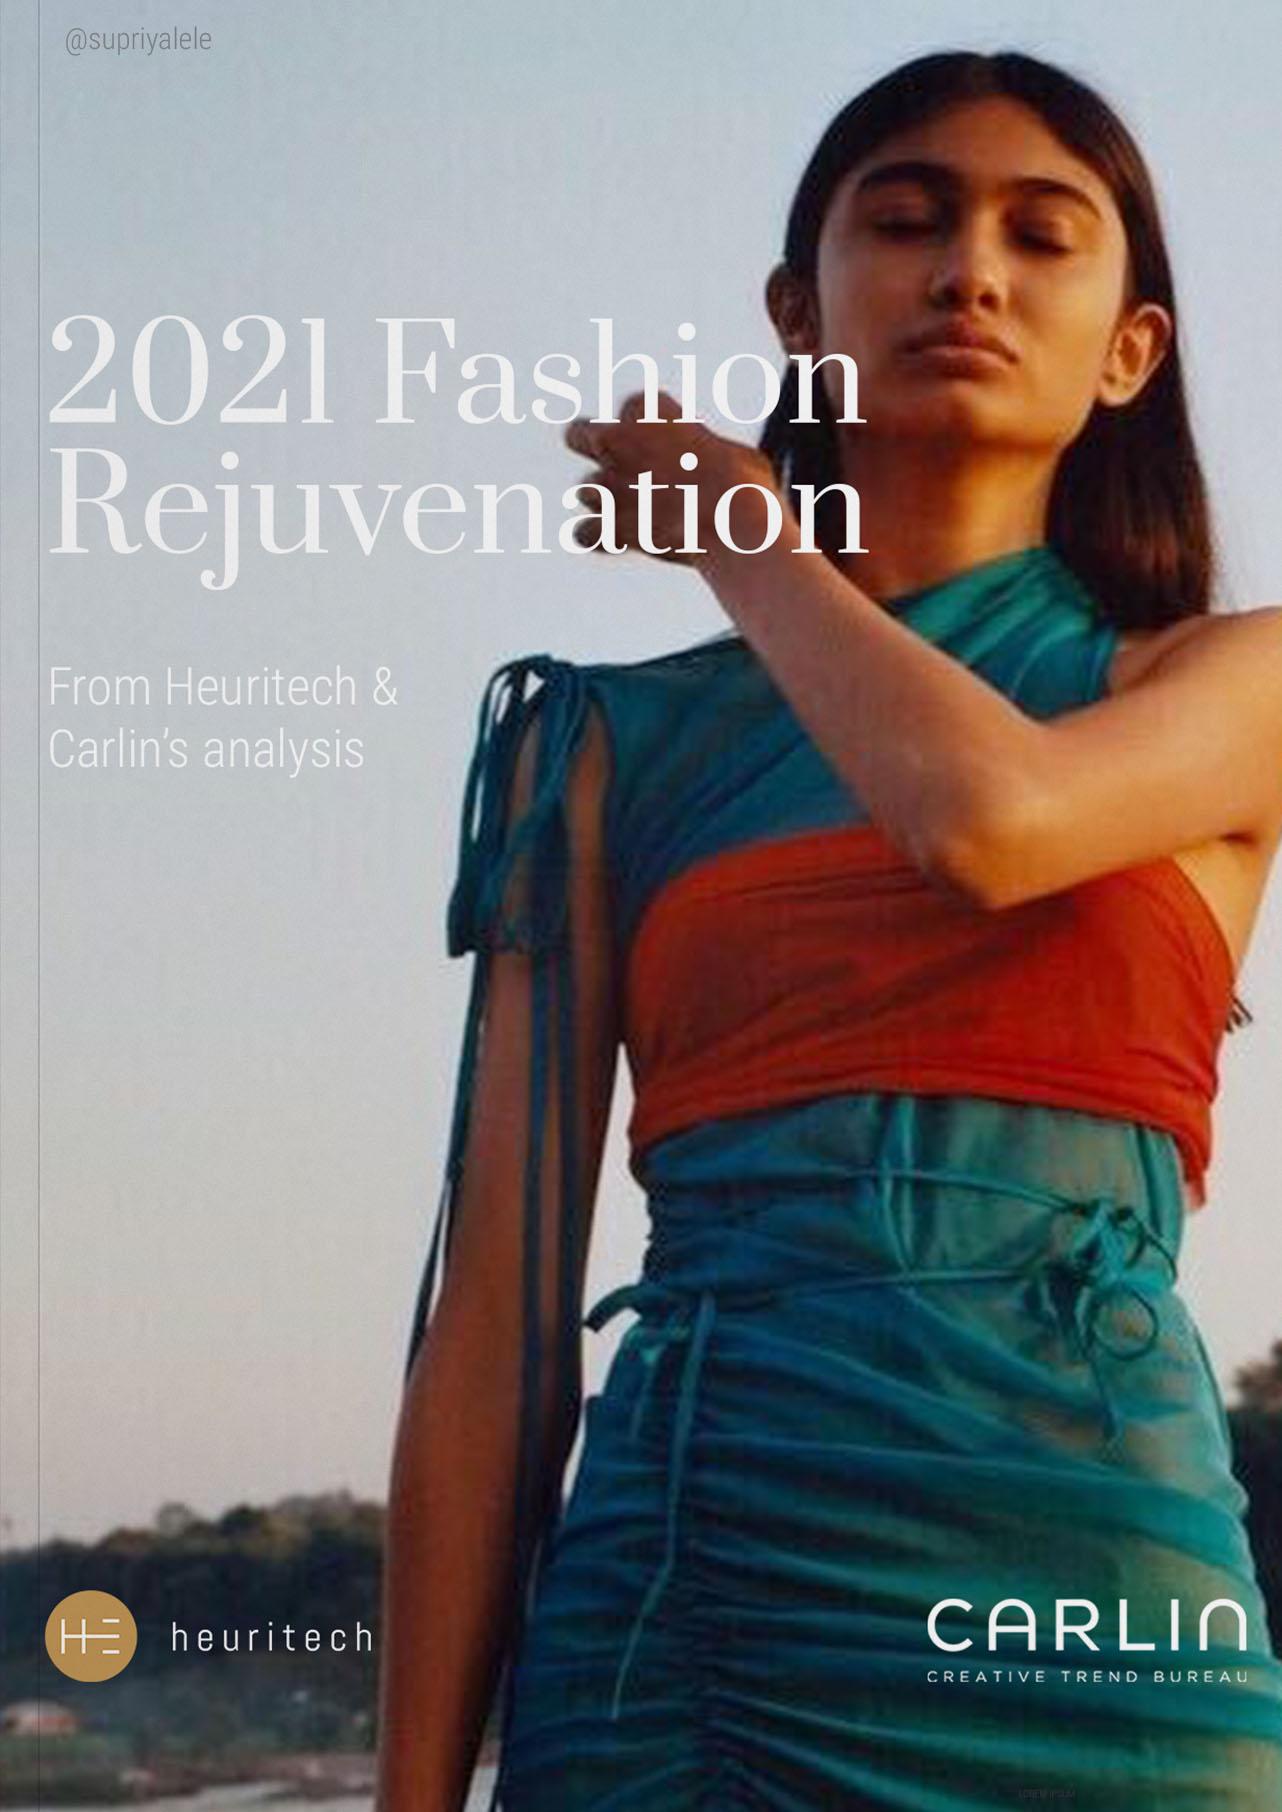 FashionRevolution_2021_mockup